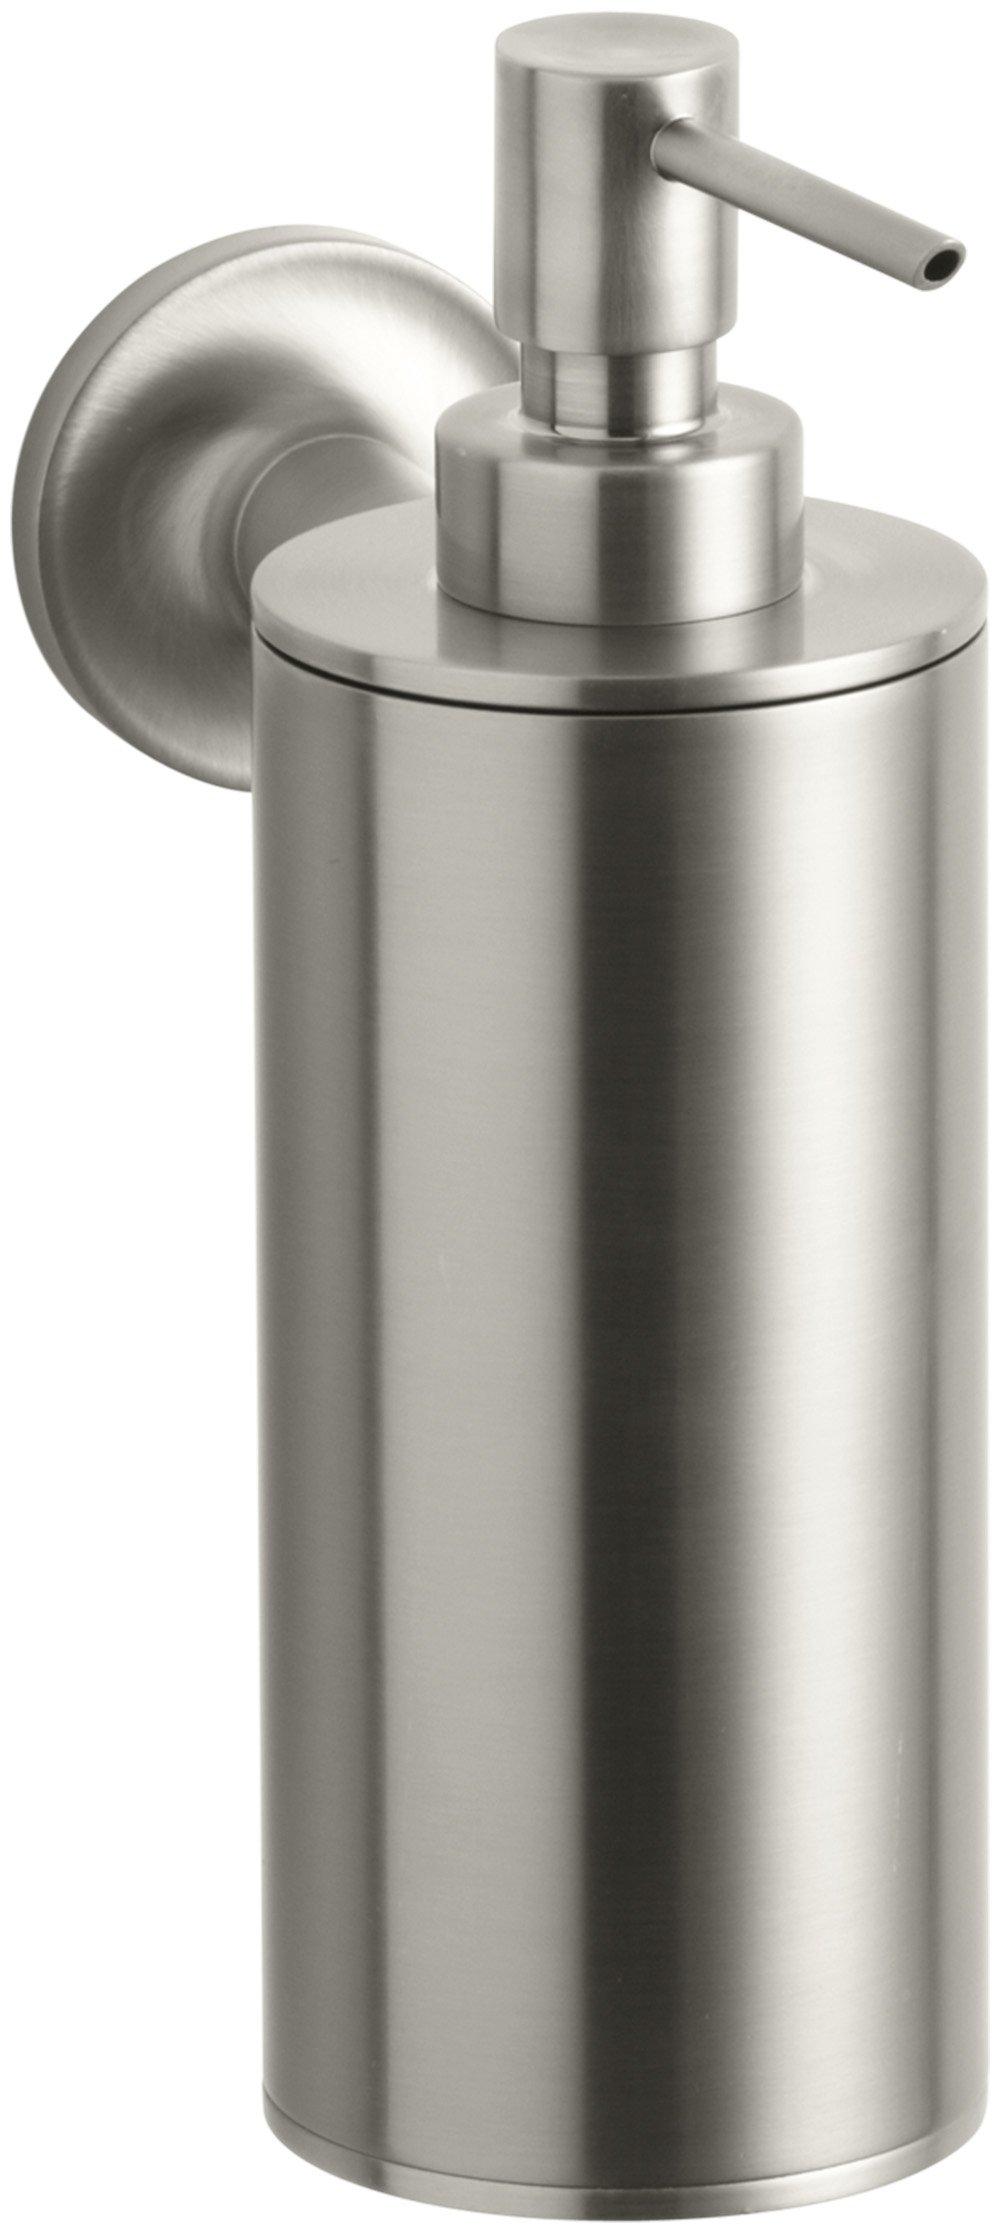 Kohler K-14380-BN Purist Wall-Mounted Soap Dispenser, Vibrant Brushed Nickel